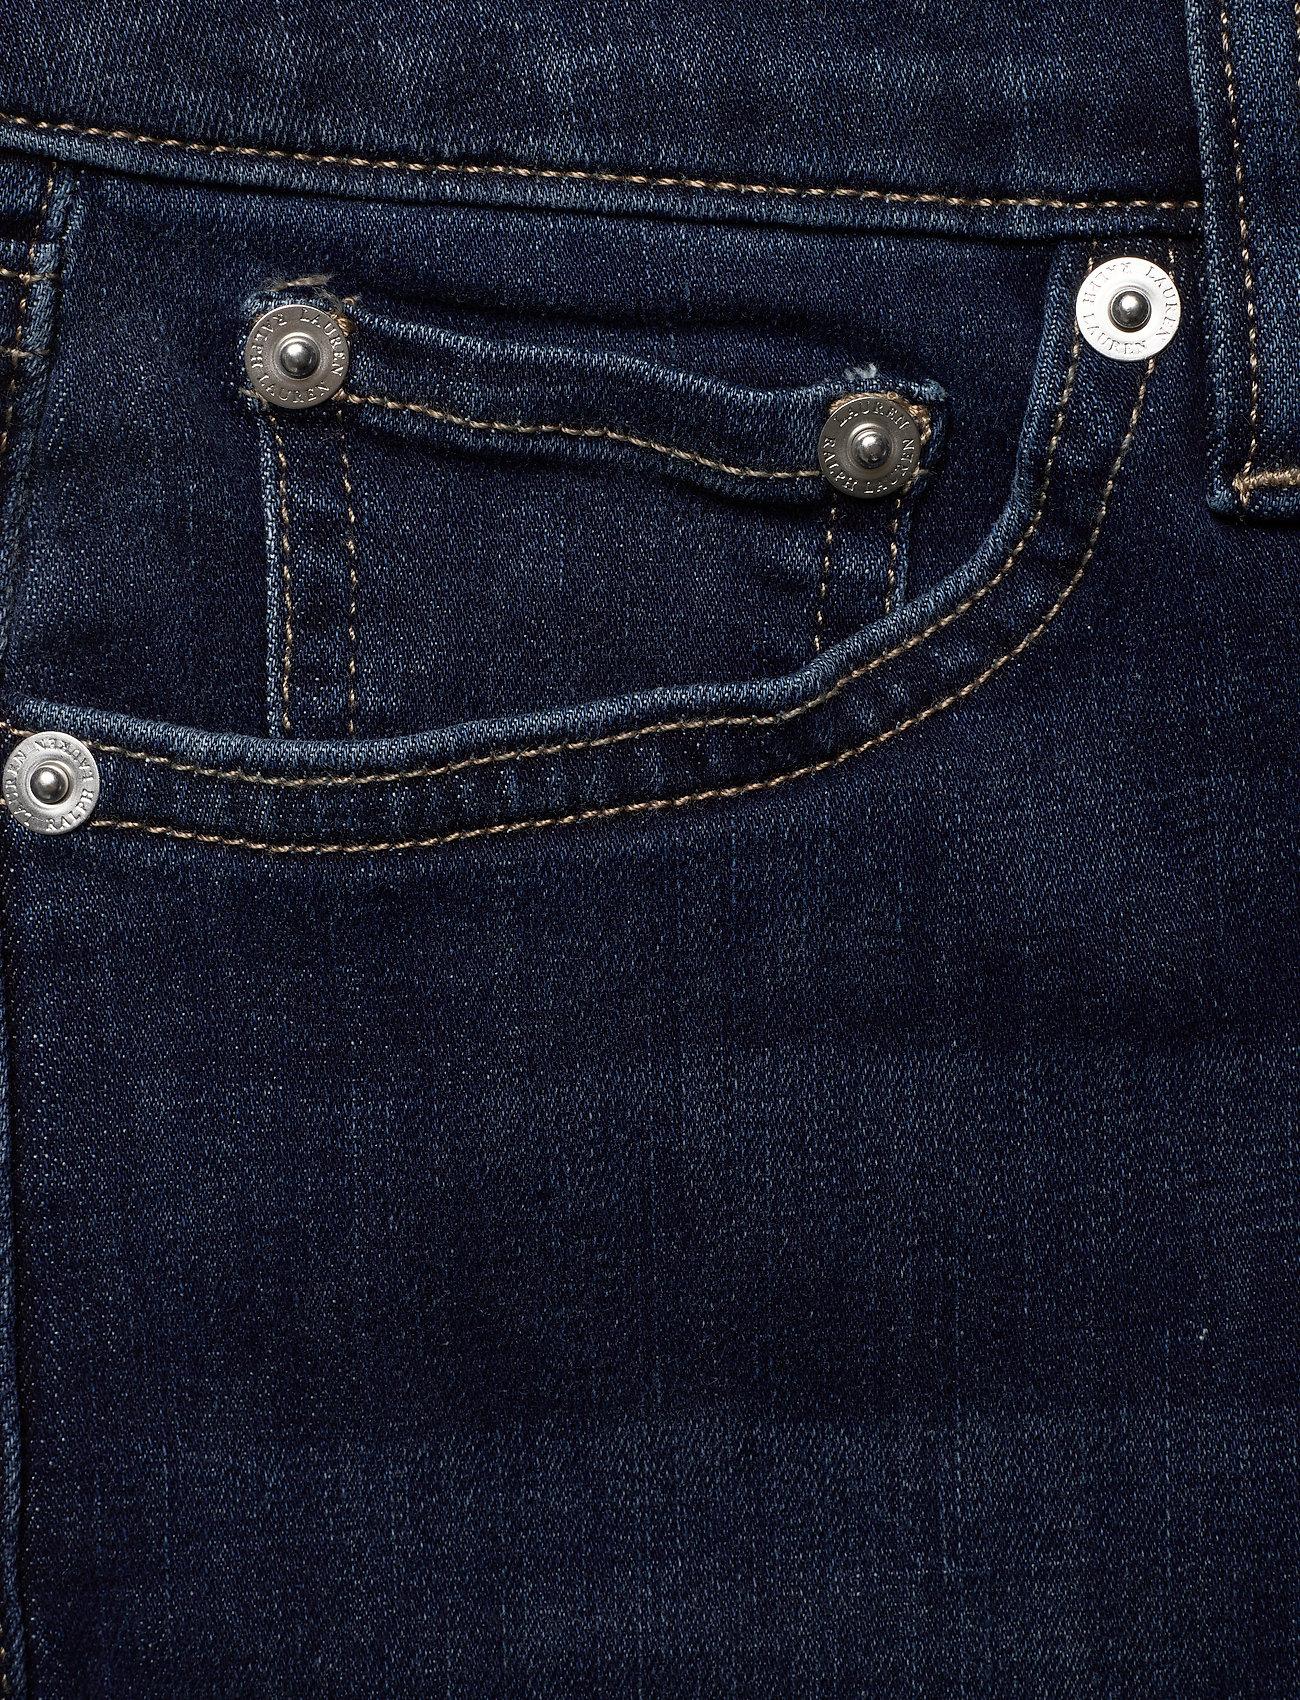 Lauren Ralph Lauren Regal Skinny Ankle Jean - Jeans TRUE INDIGO WASH - Dameklær Spesialtilbud